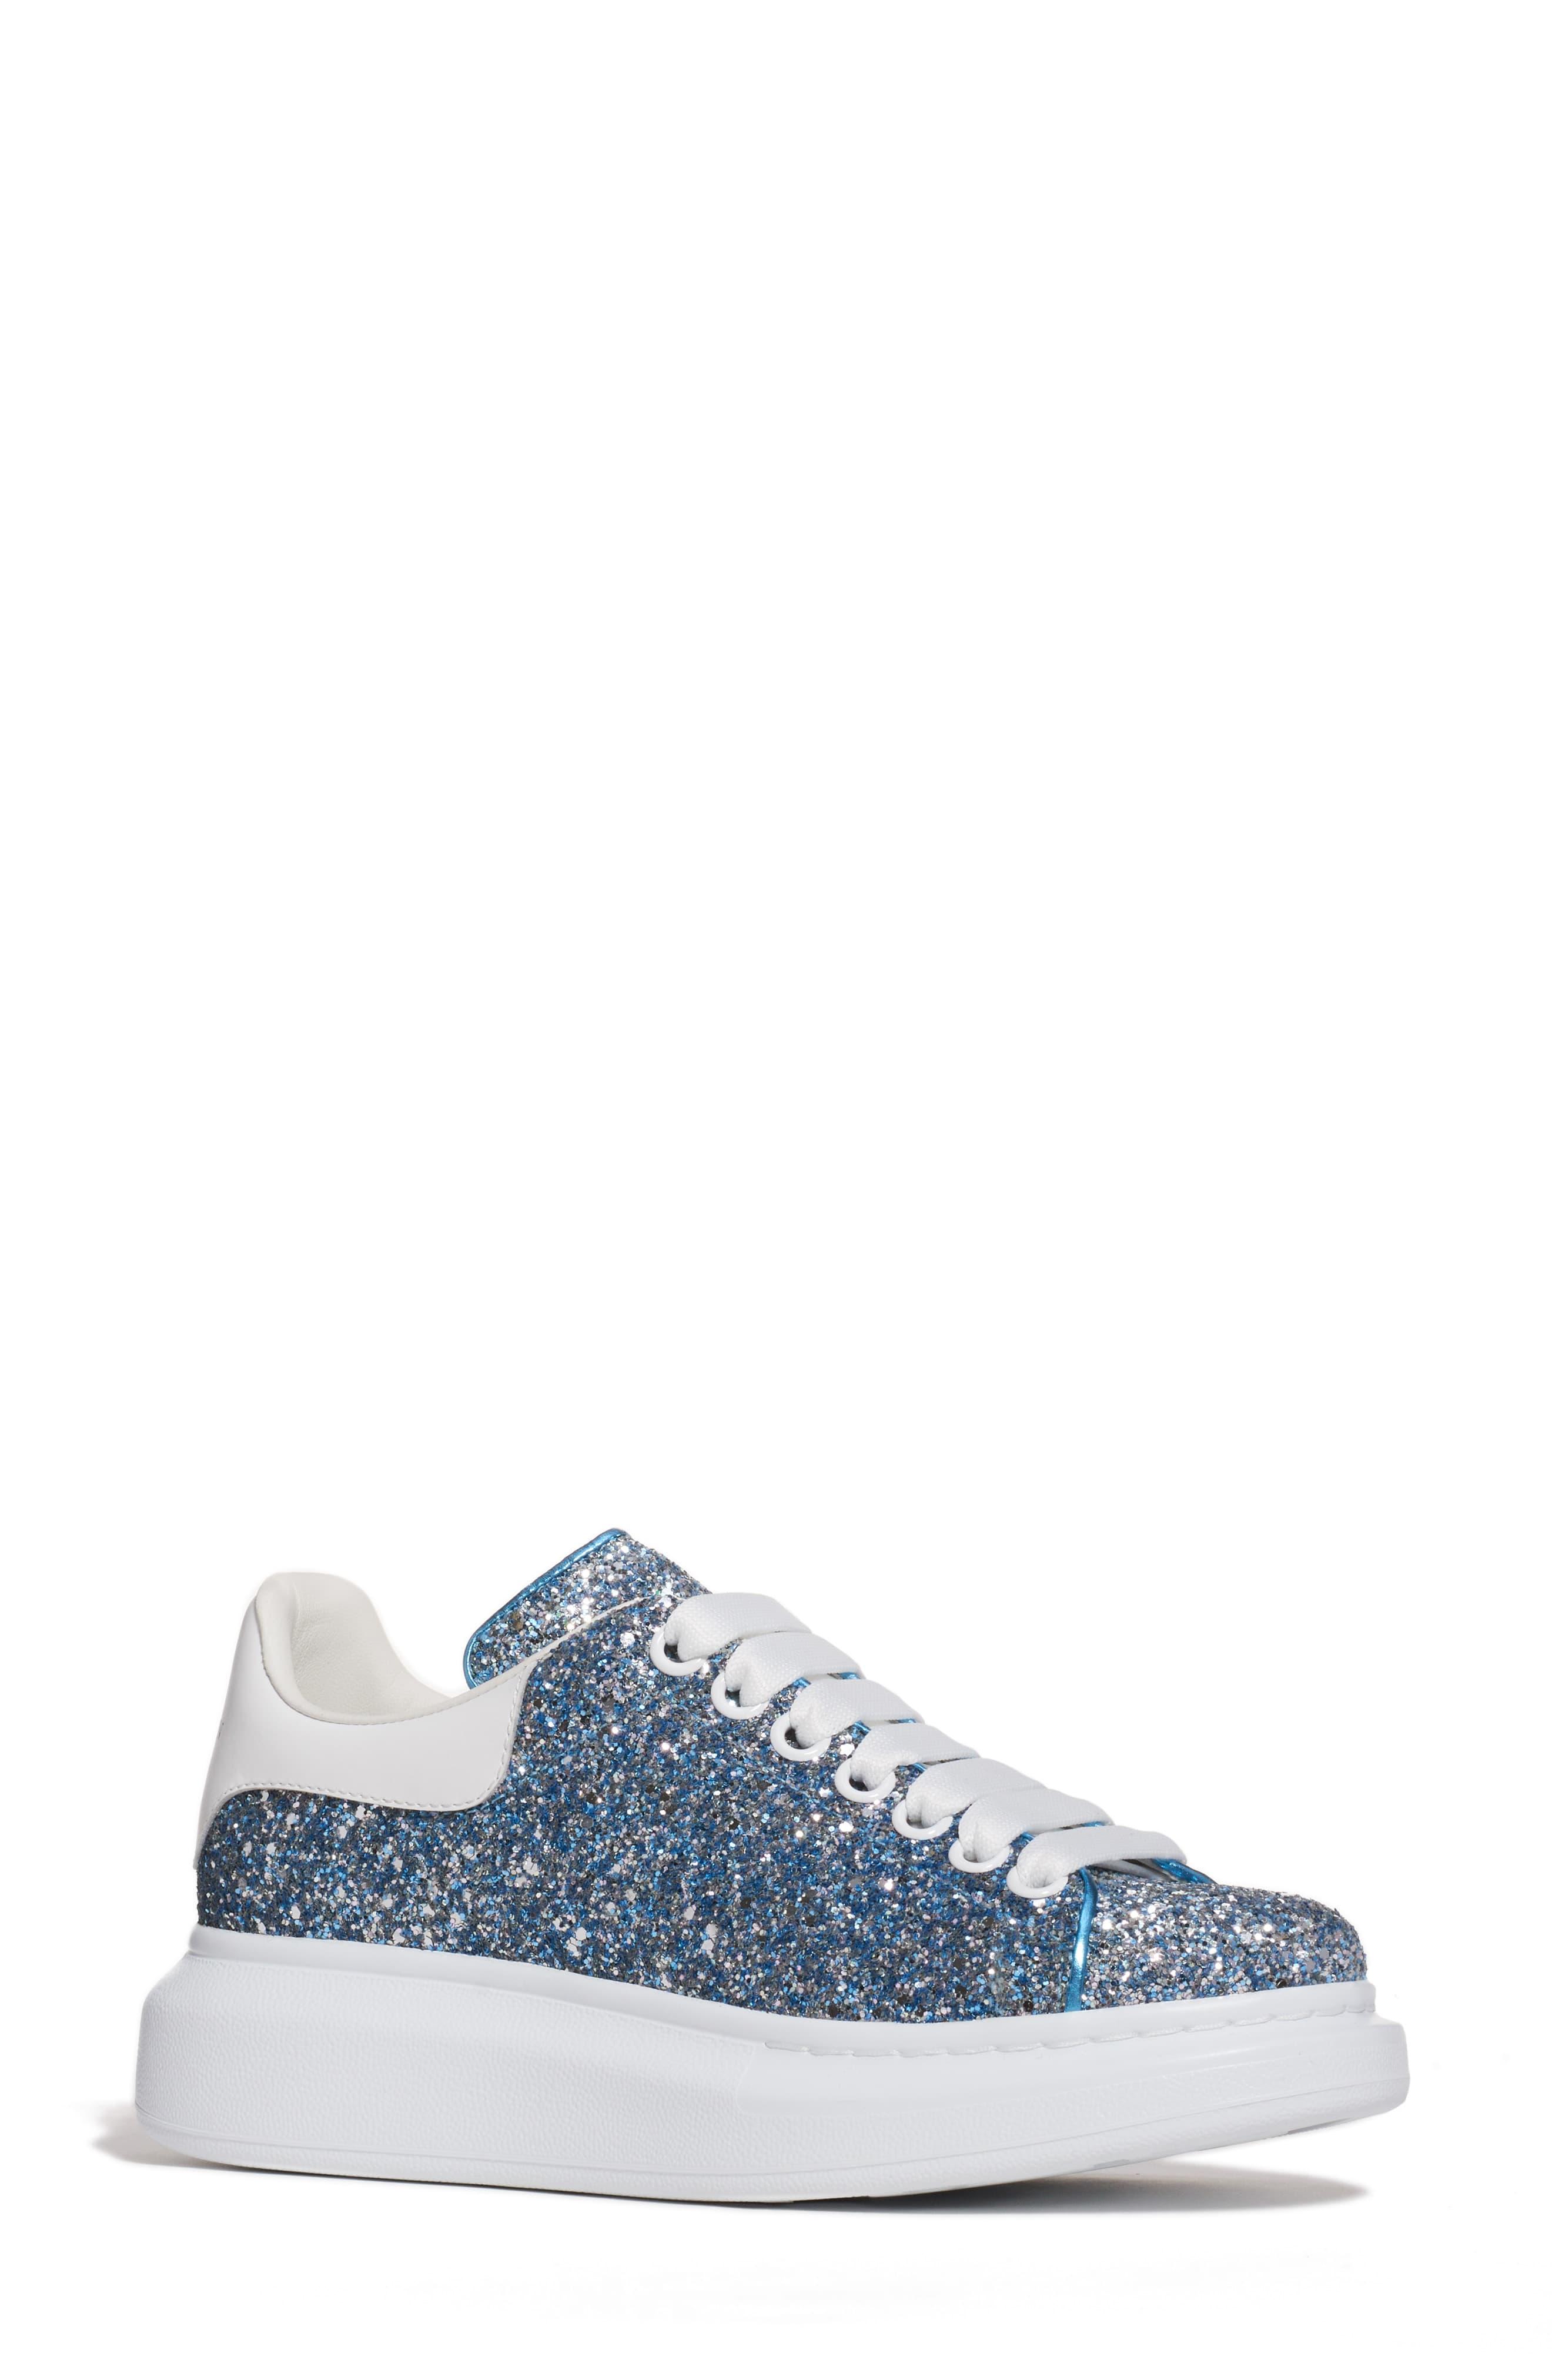 2adidas donna scarpe 35.5